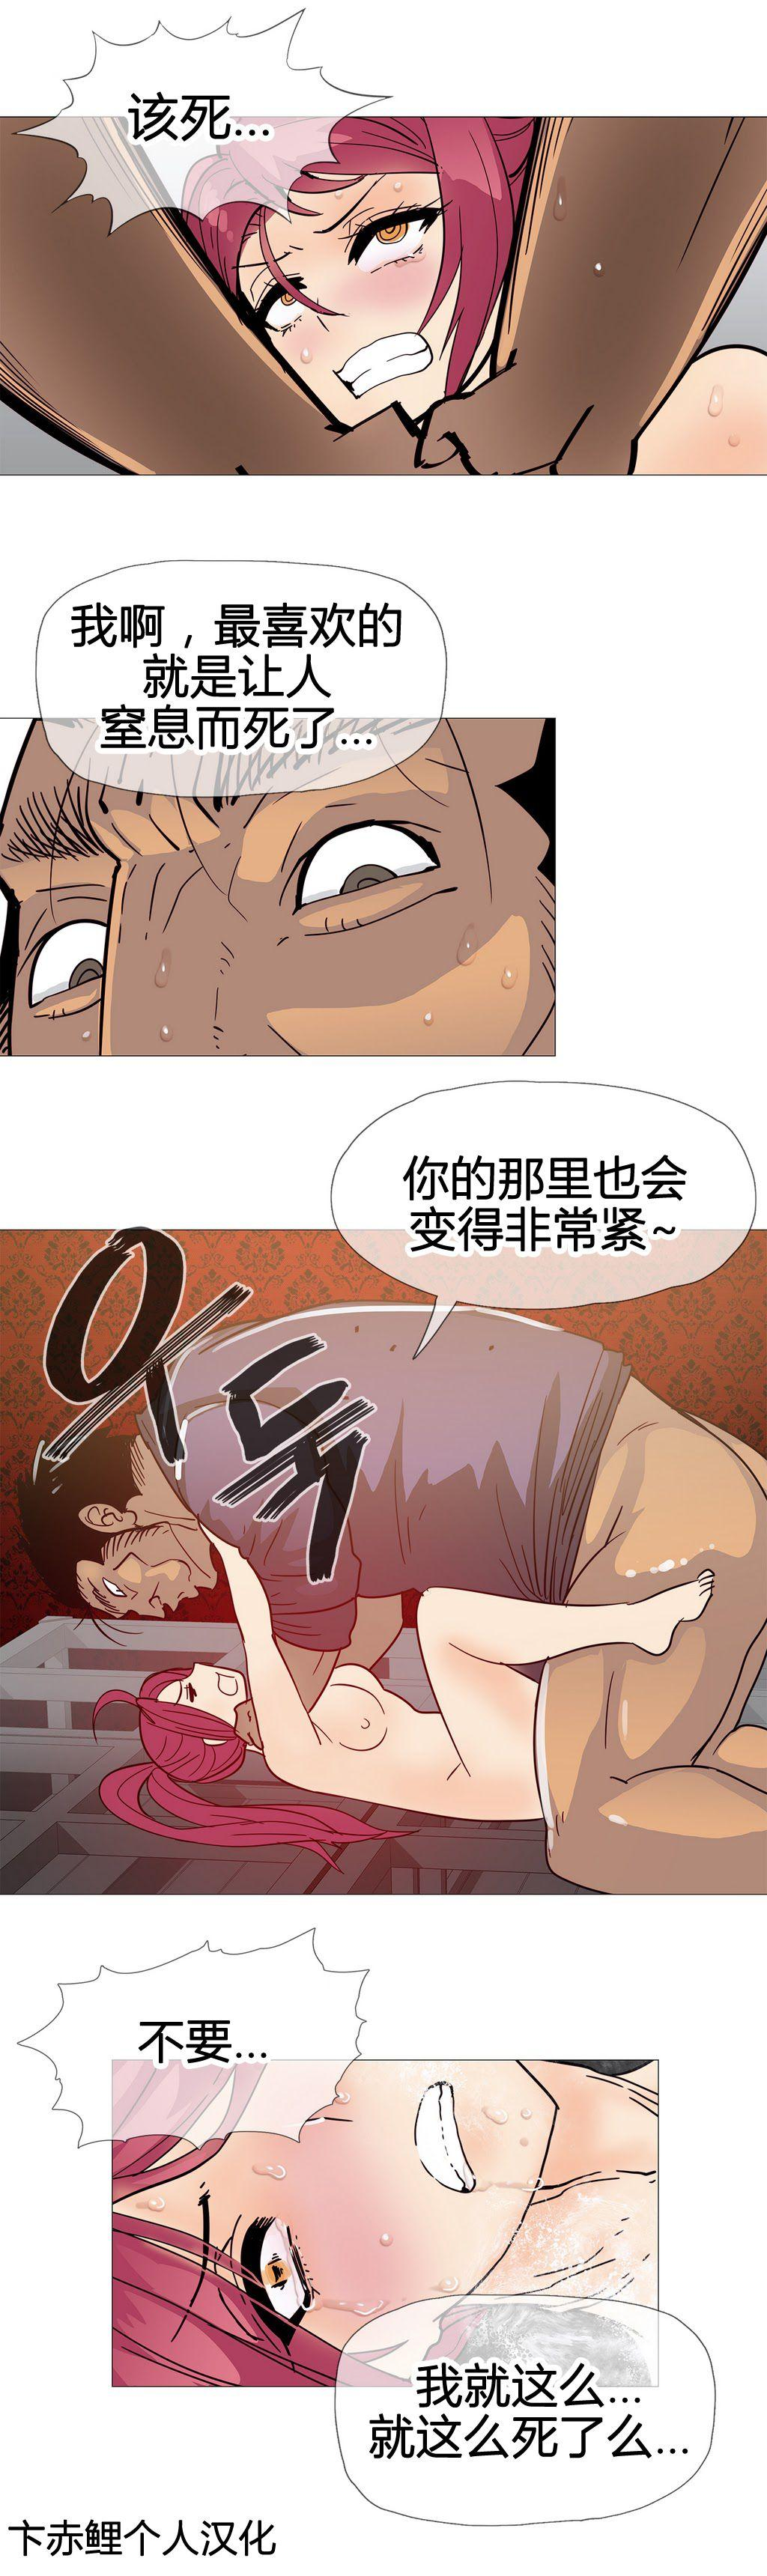 HouseHold Affairs 【卞赤鲤个人汉化】1~33话(持续更新中) 206